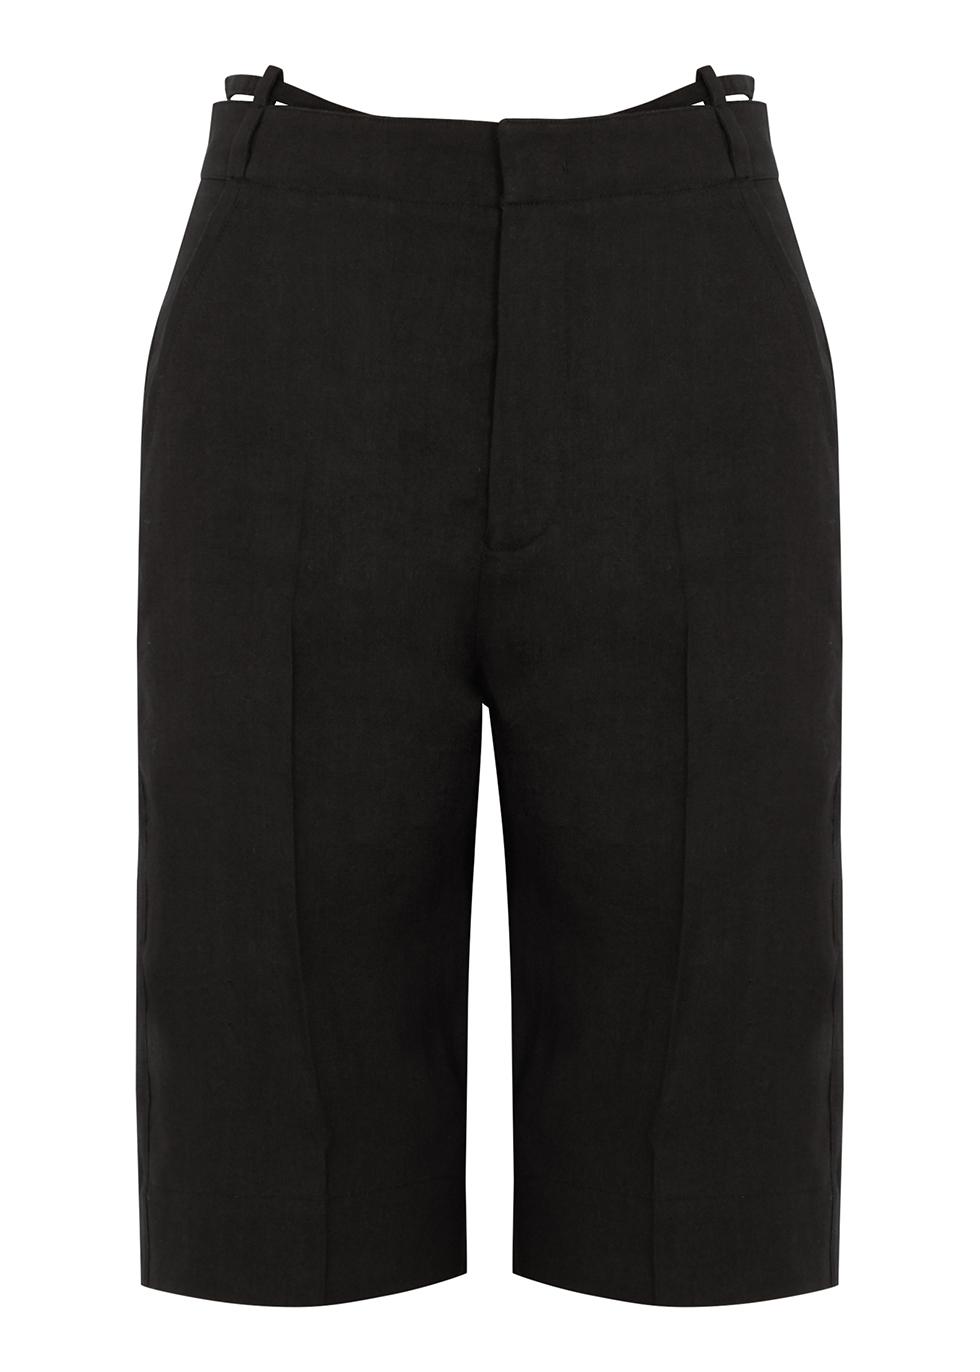 Le Short Gardian black shorts